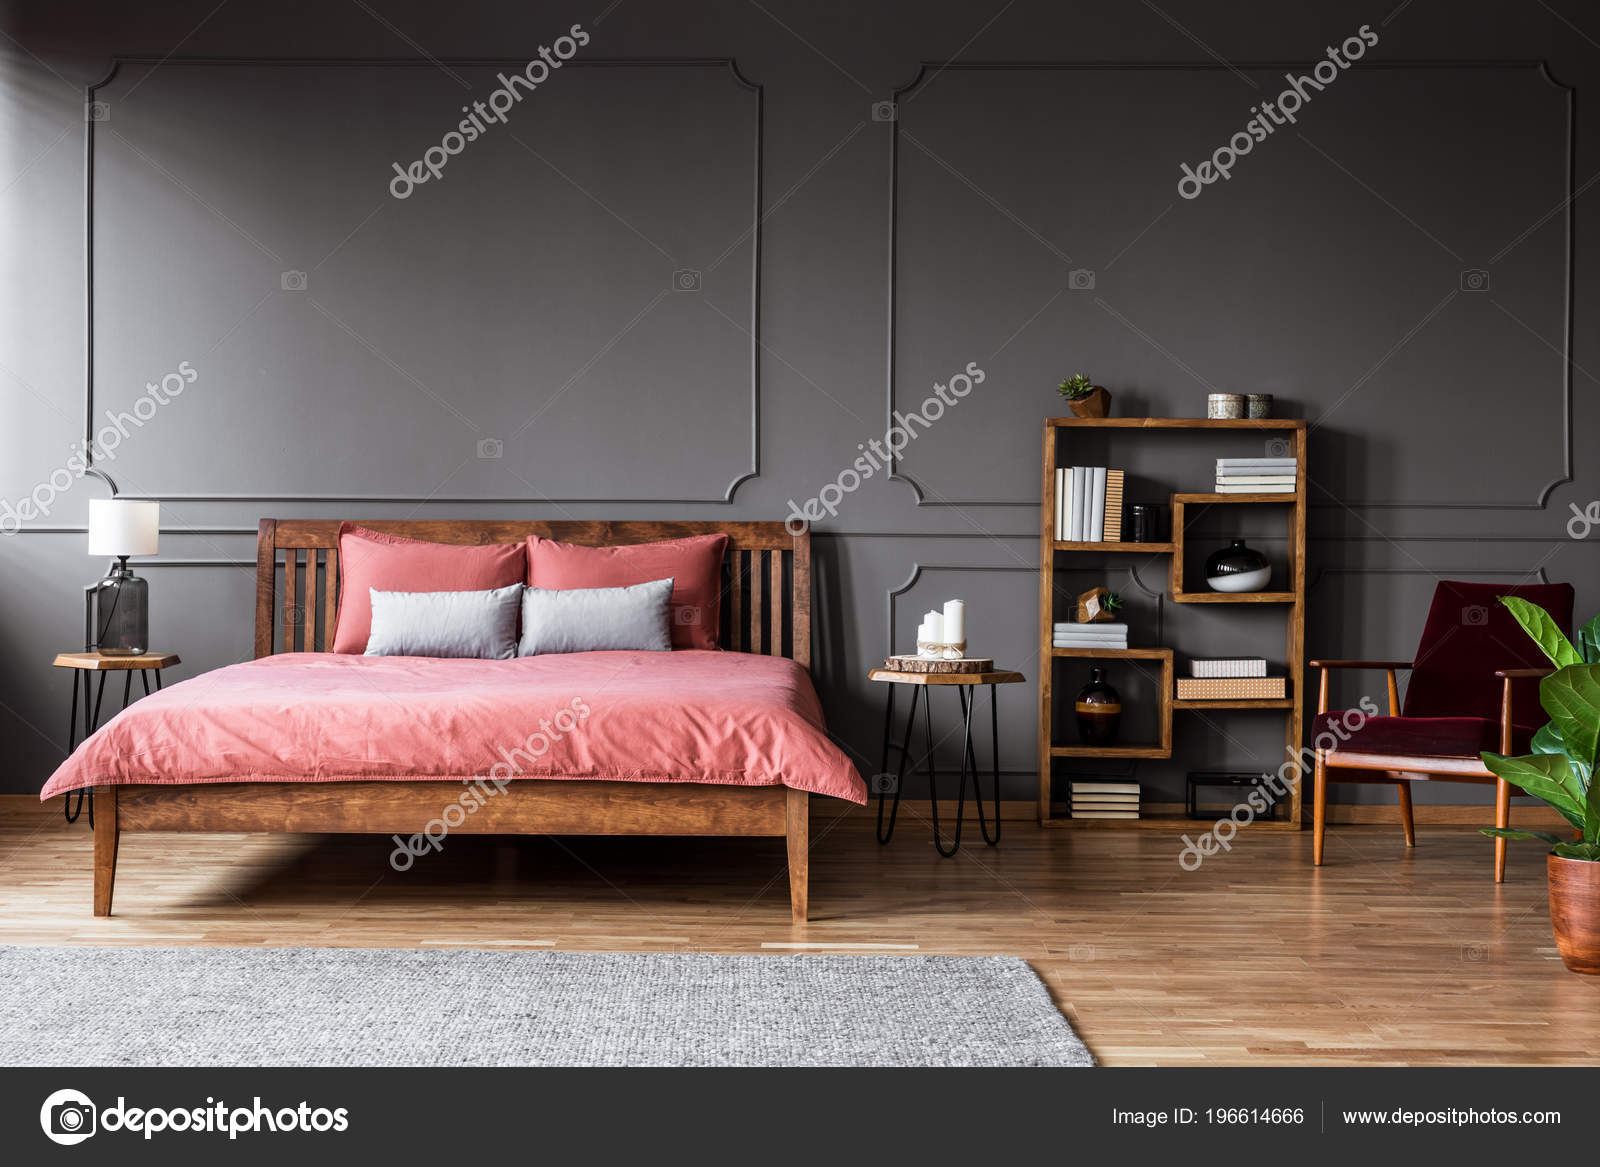 https depositphotos com 196614666 stock photo real photo spacious bedroom interior html